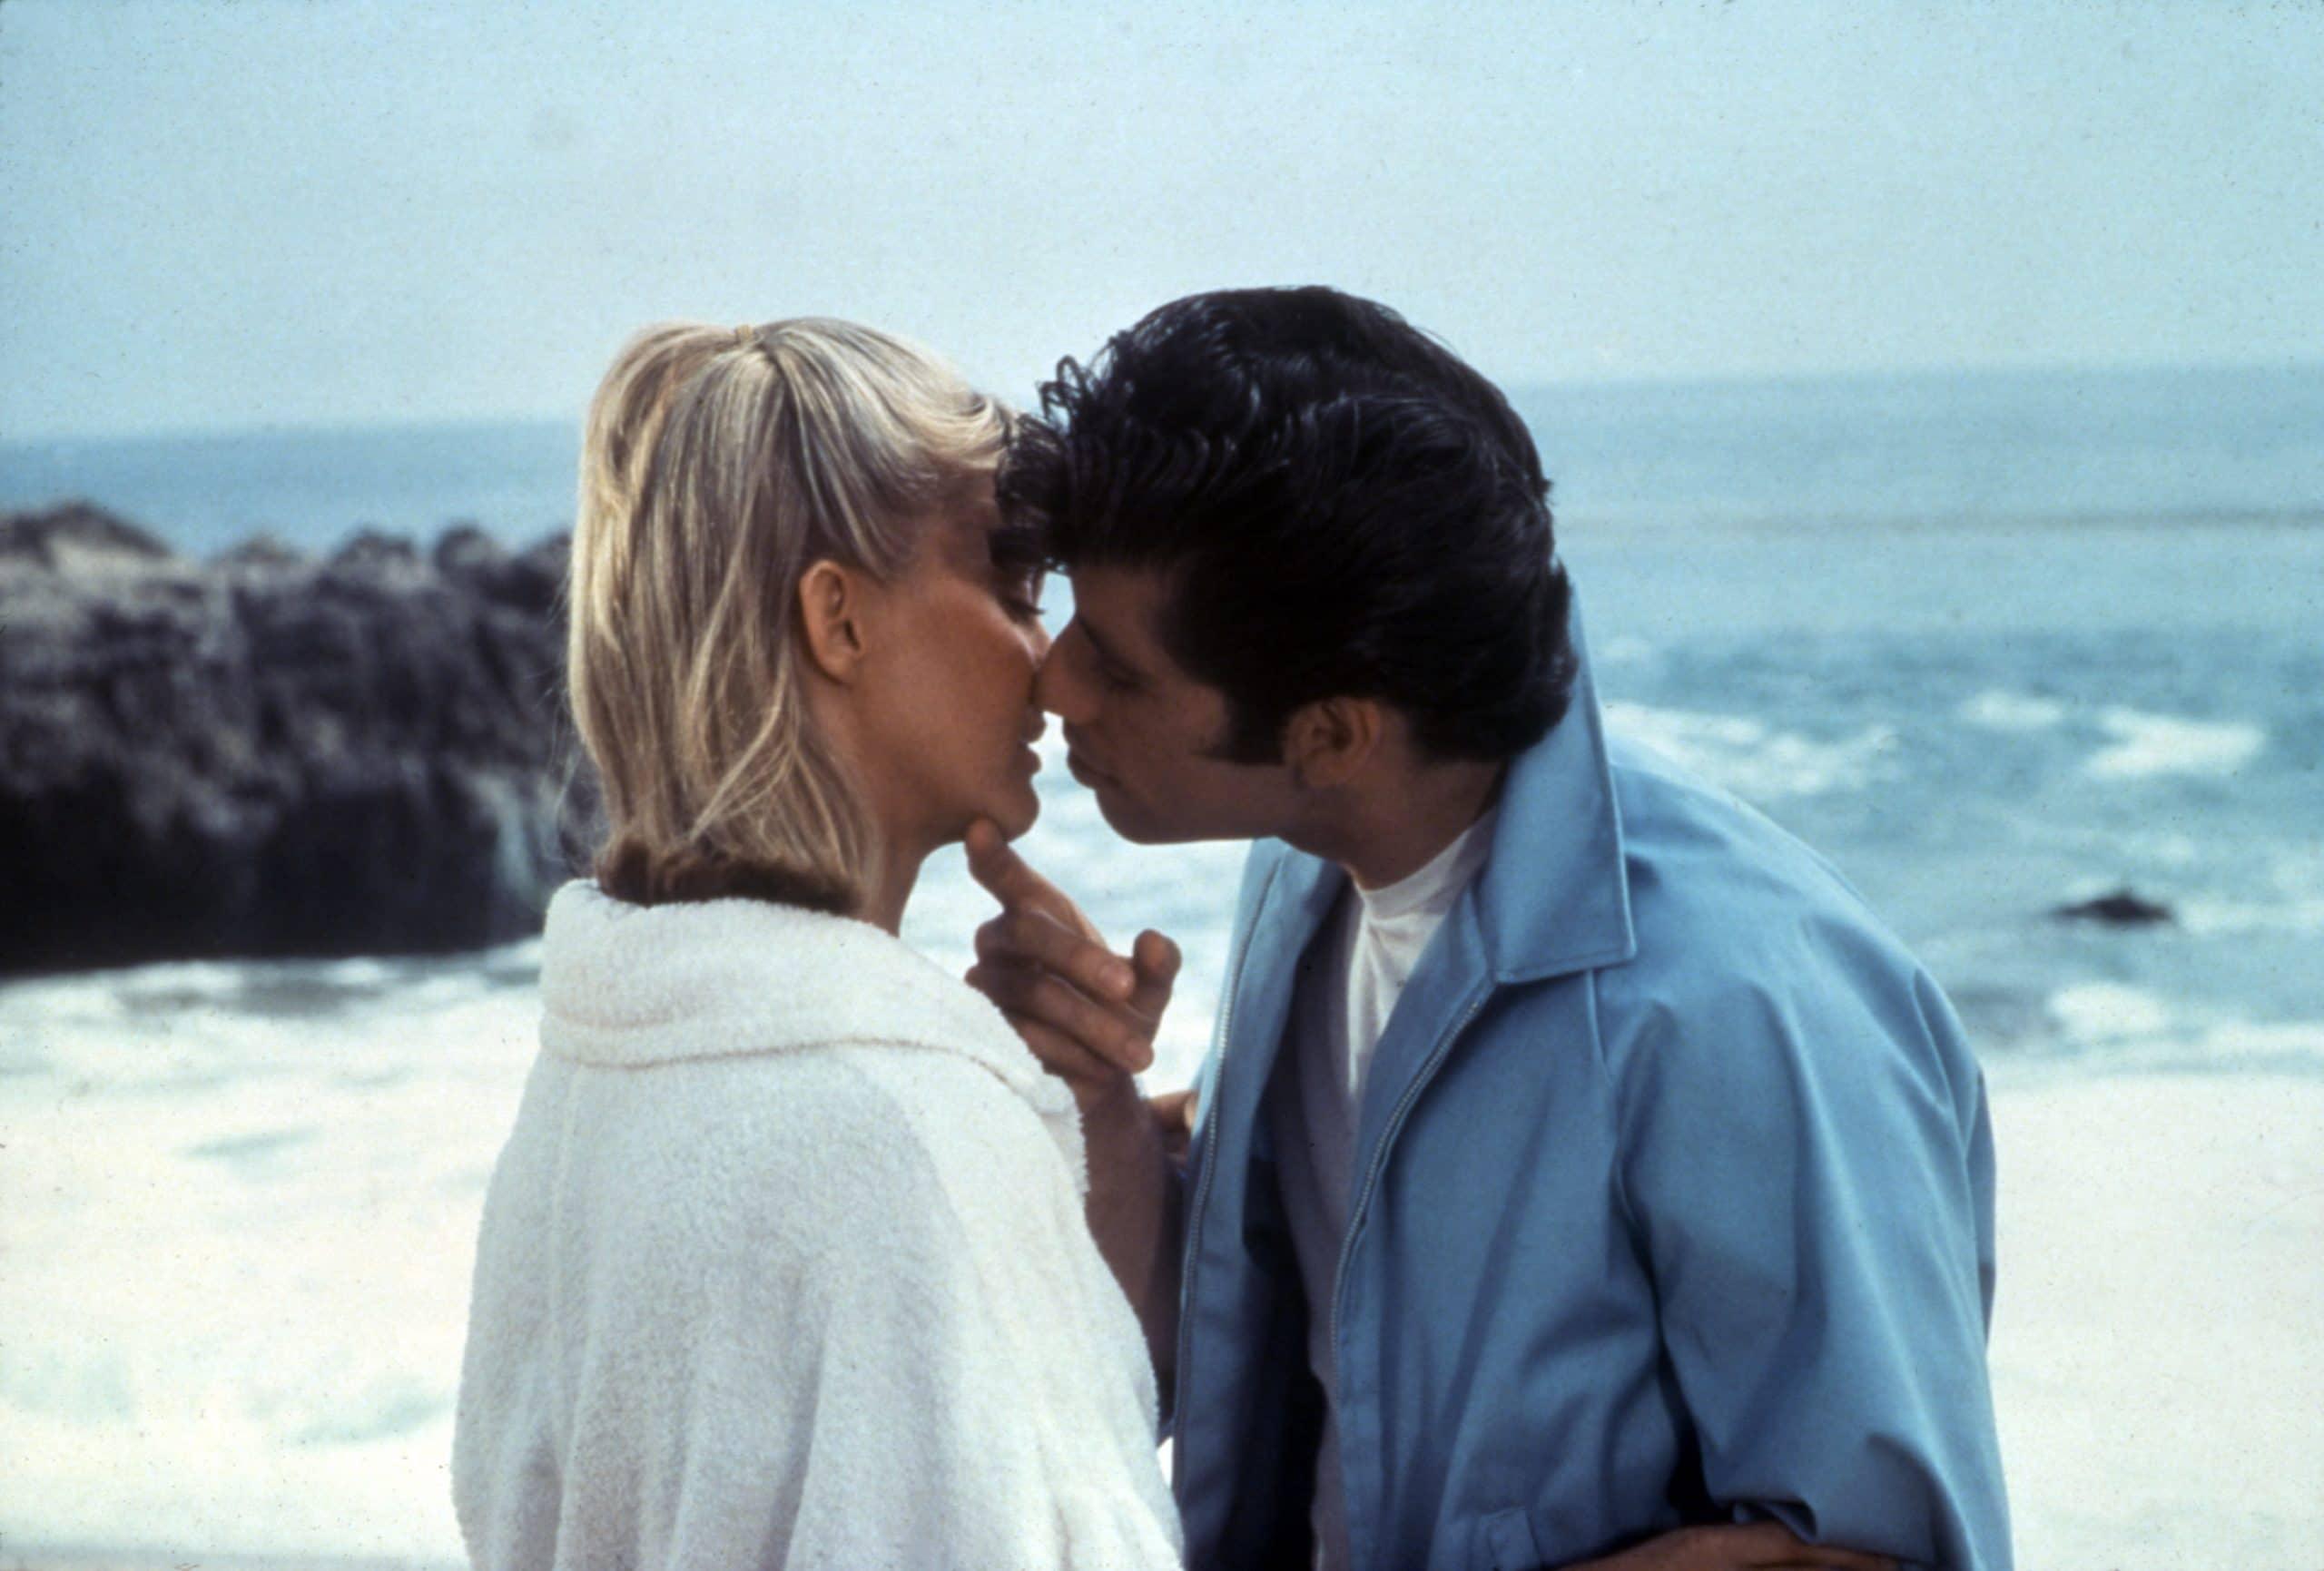 GREASE, Olivia Newton-John, John Travolta kissing scene